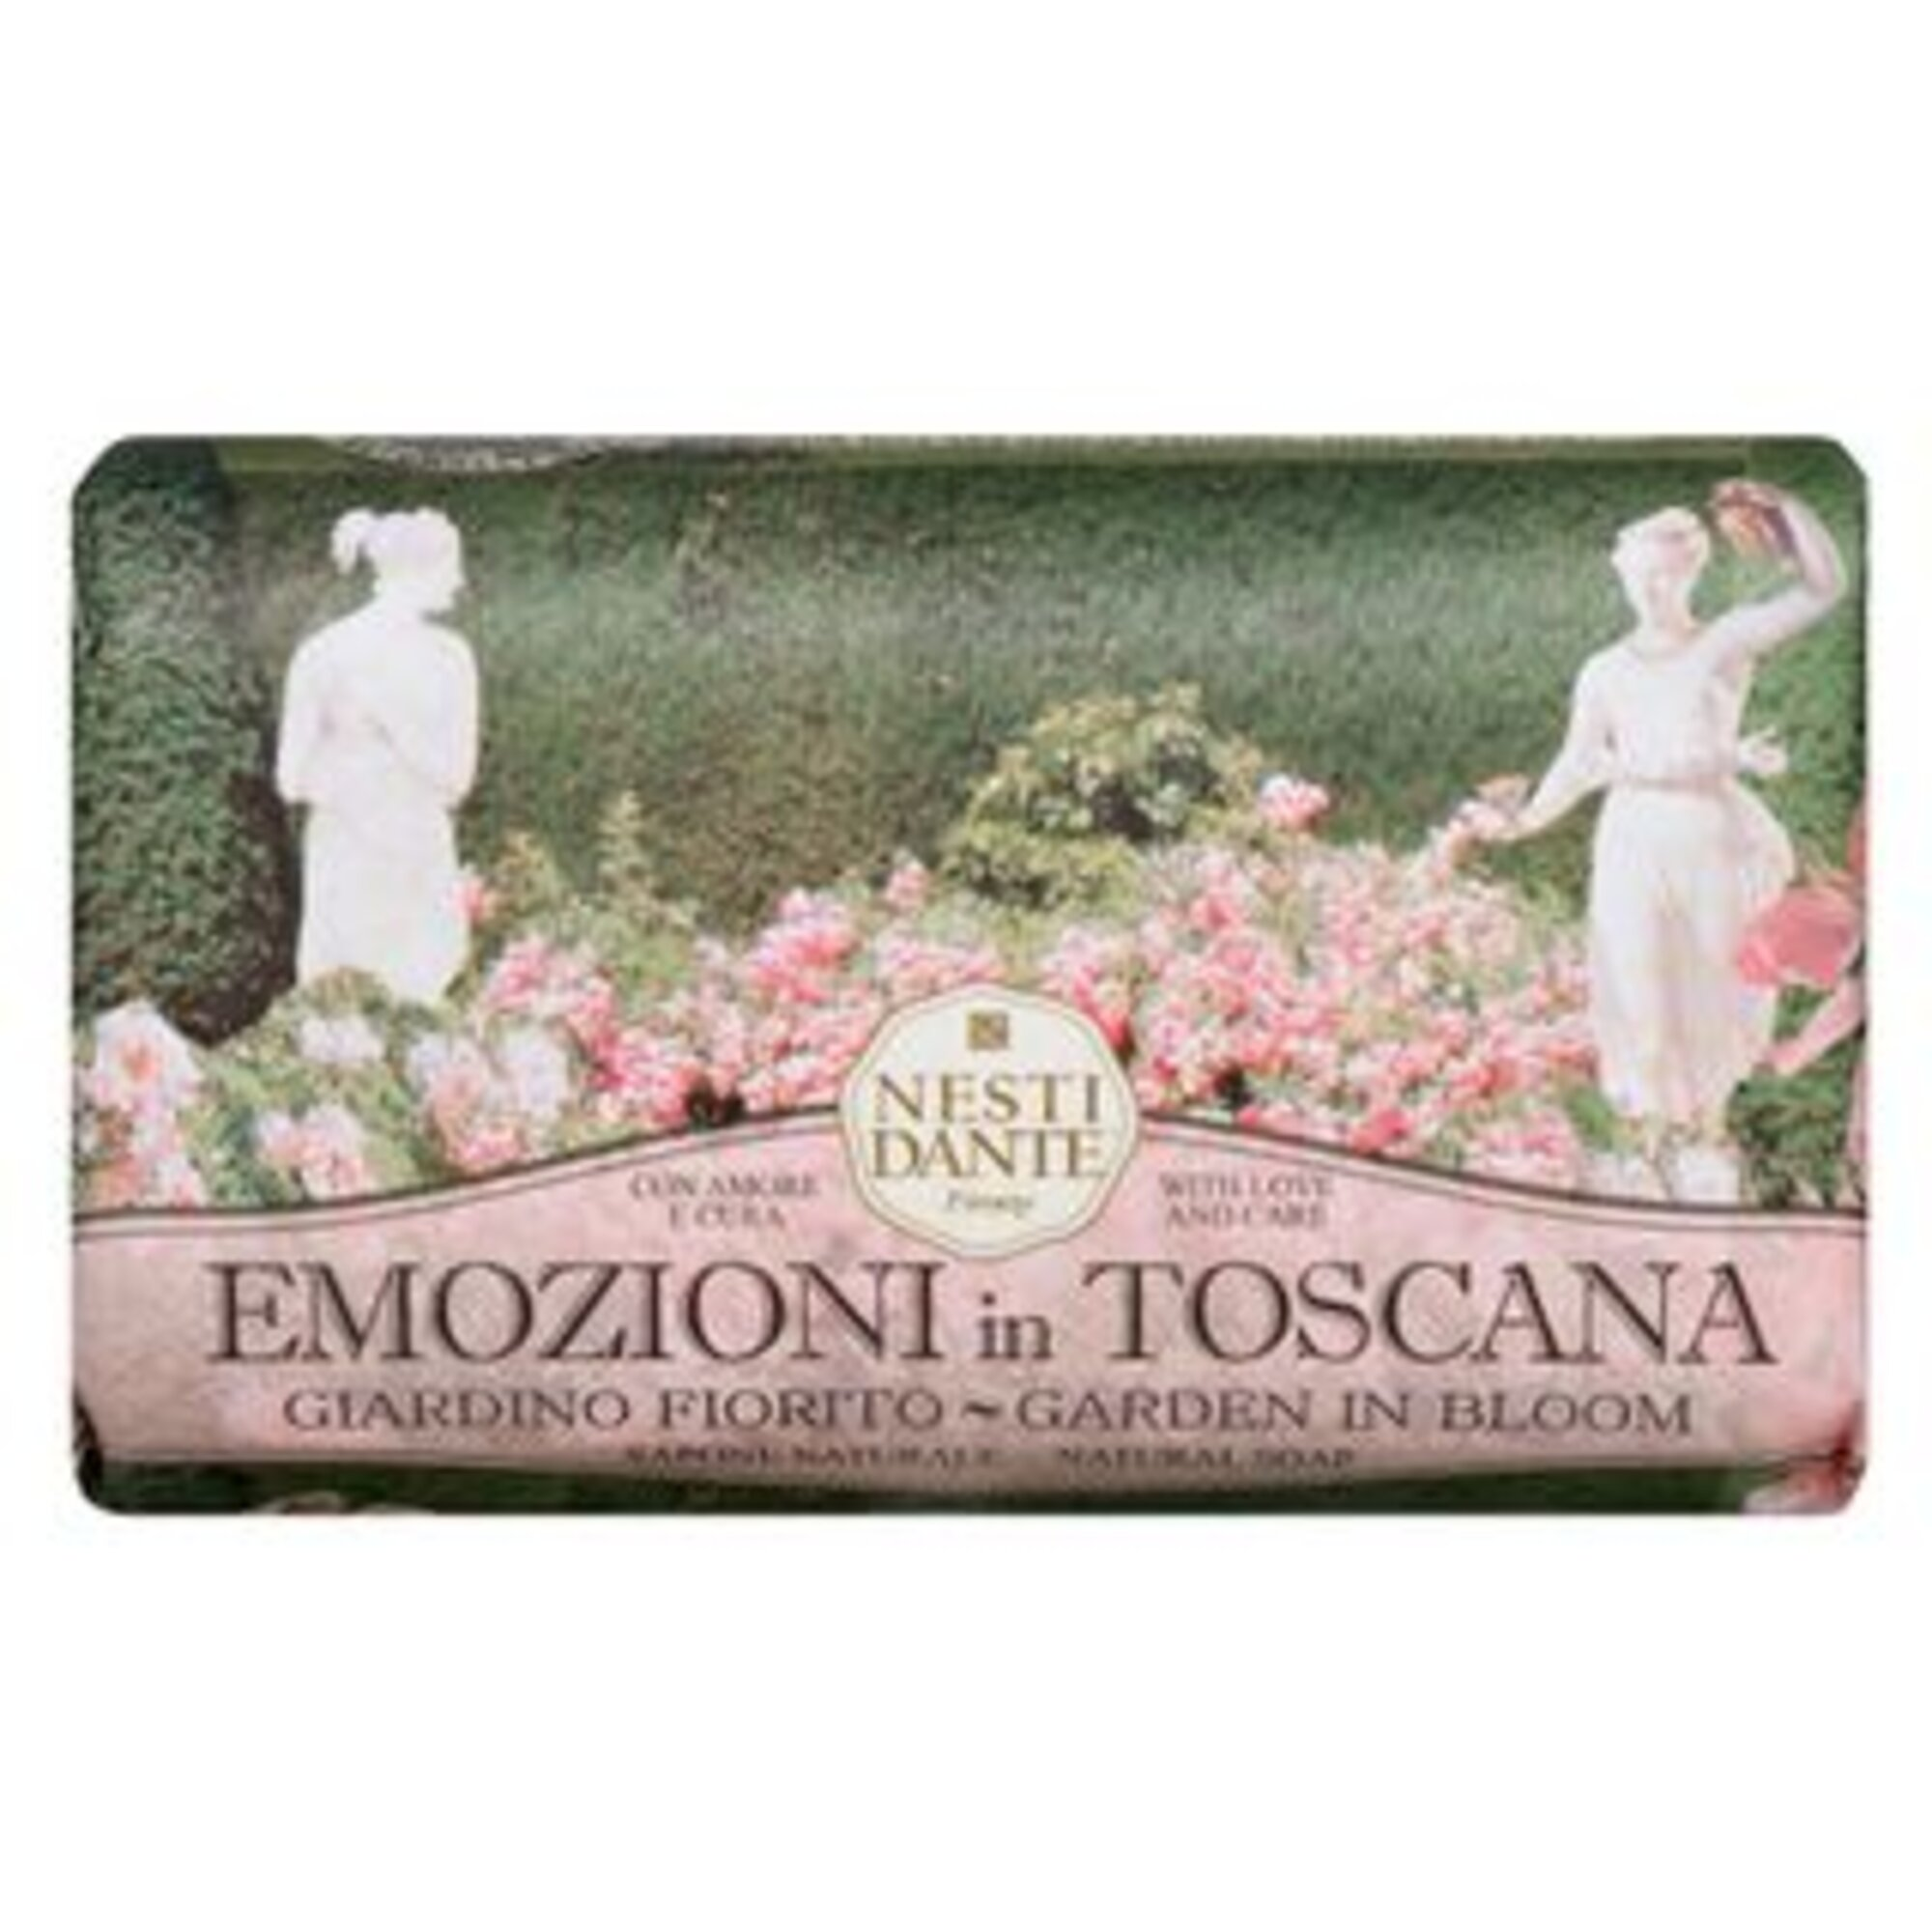 Sabonete Emozioni In Toscana Jardim Florido 250g Nesti Dante